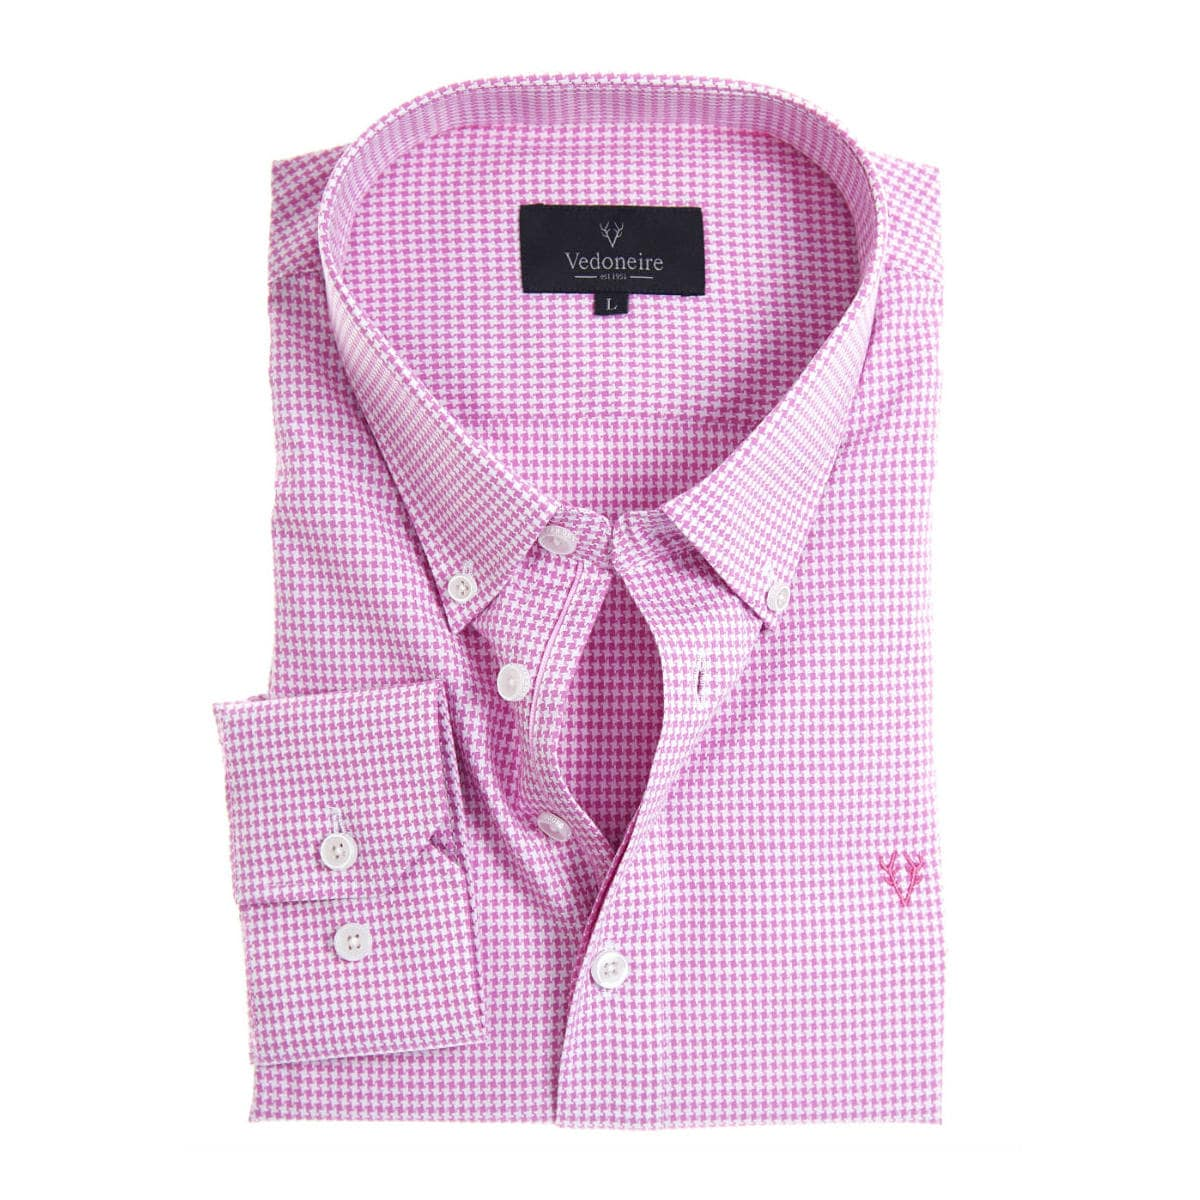 Soft Peach Finish Shirt houndstooth pink